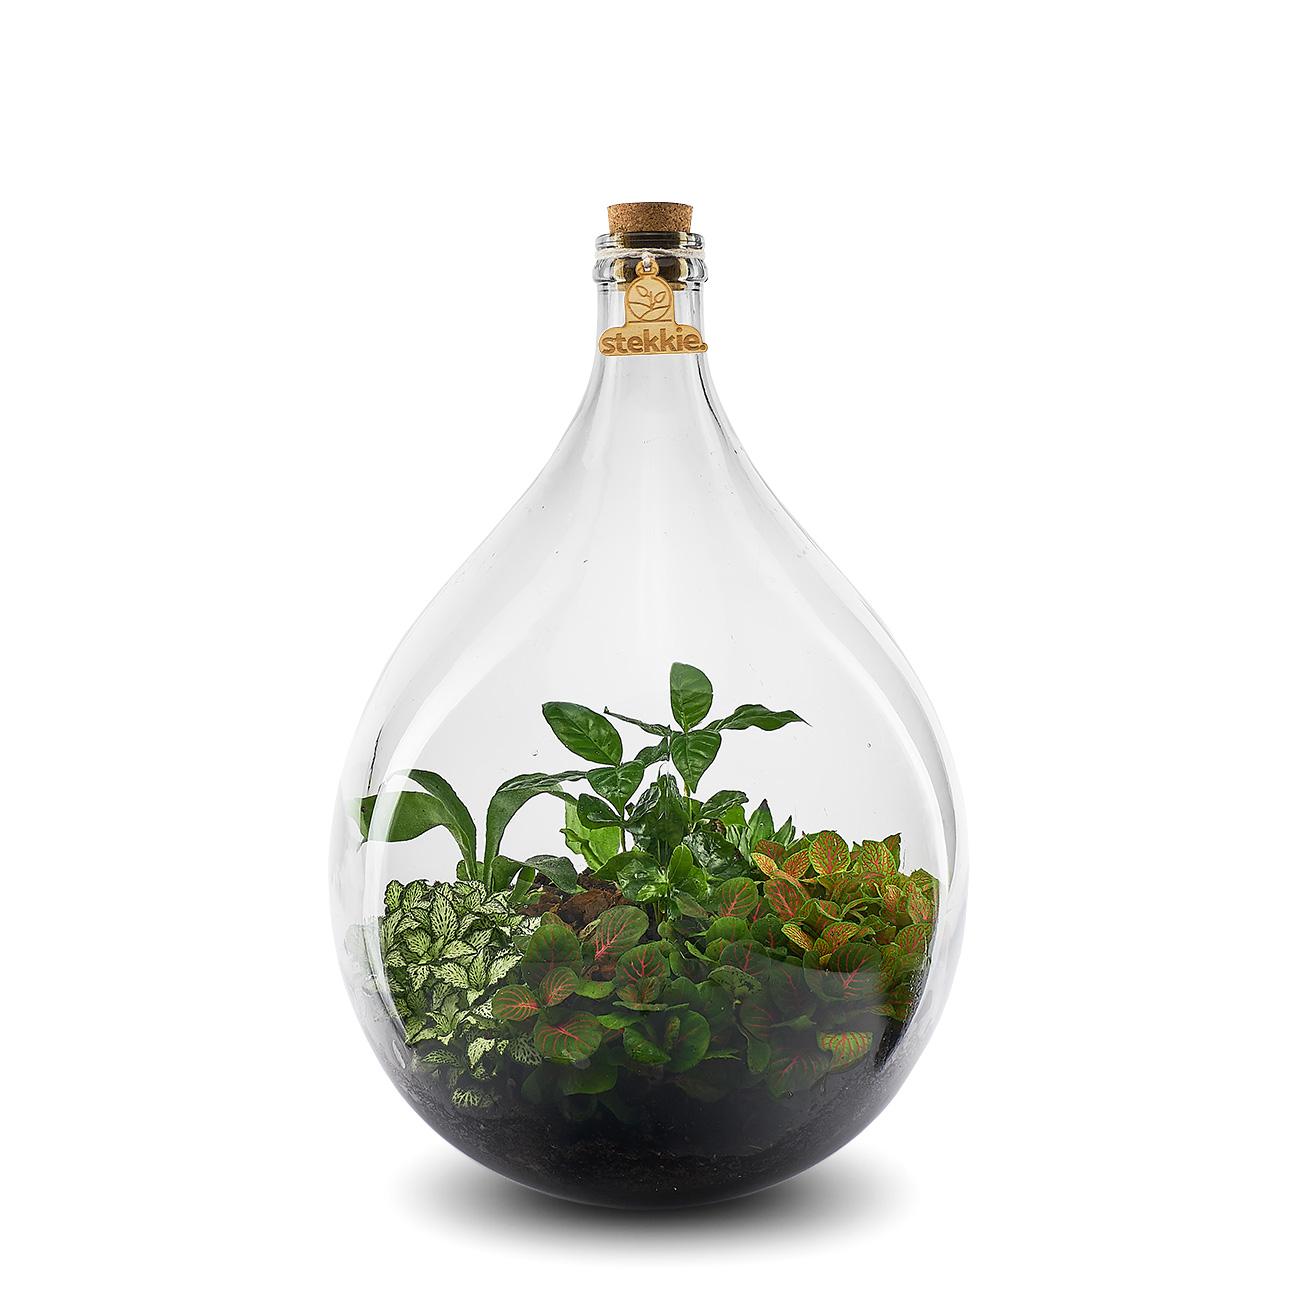 Stekkie Large mini-ecosysteem met gele accentkleur en koffieplant